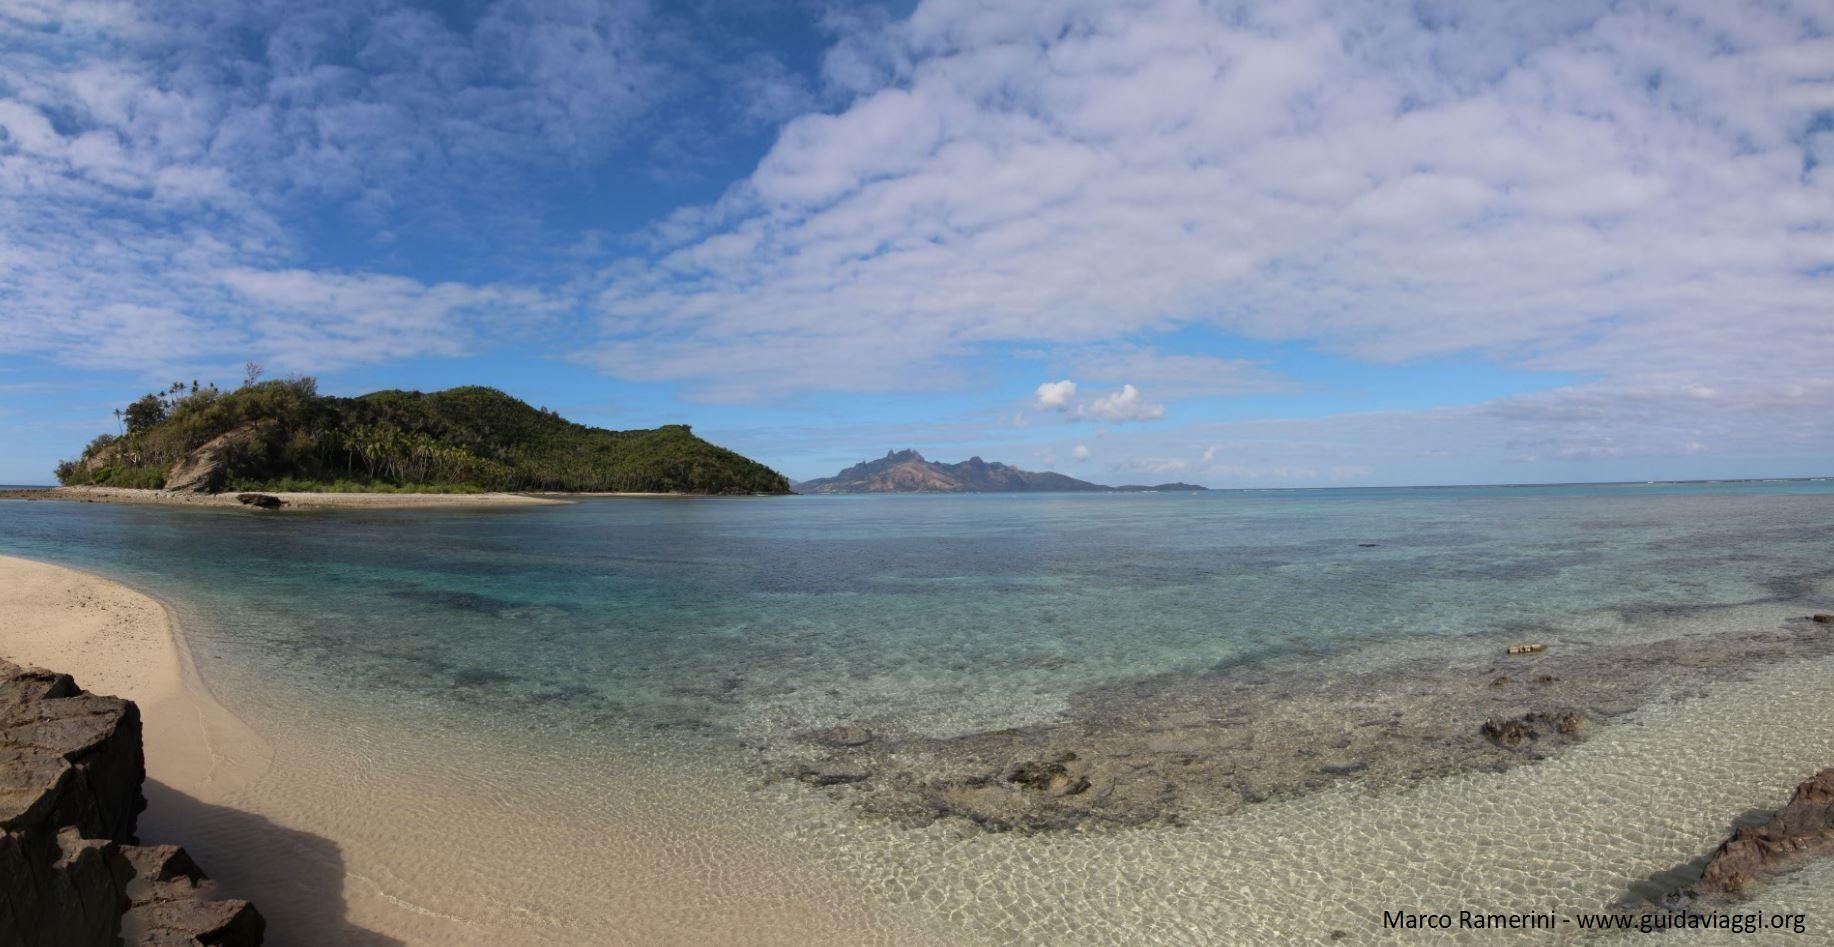 Panoramica della laguna di Narara vista da Naukacuvu, Isole Yasawa, Figi. Autore e Copyright Marco Ramerini